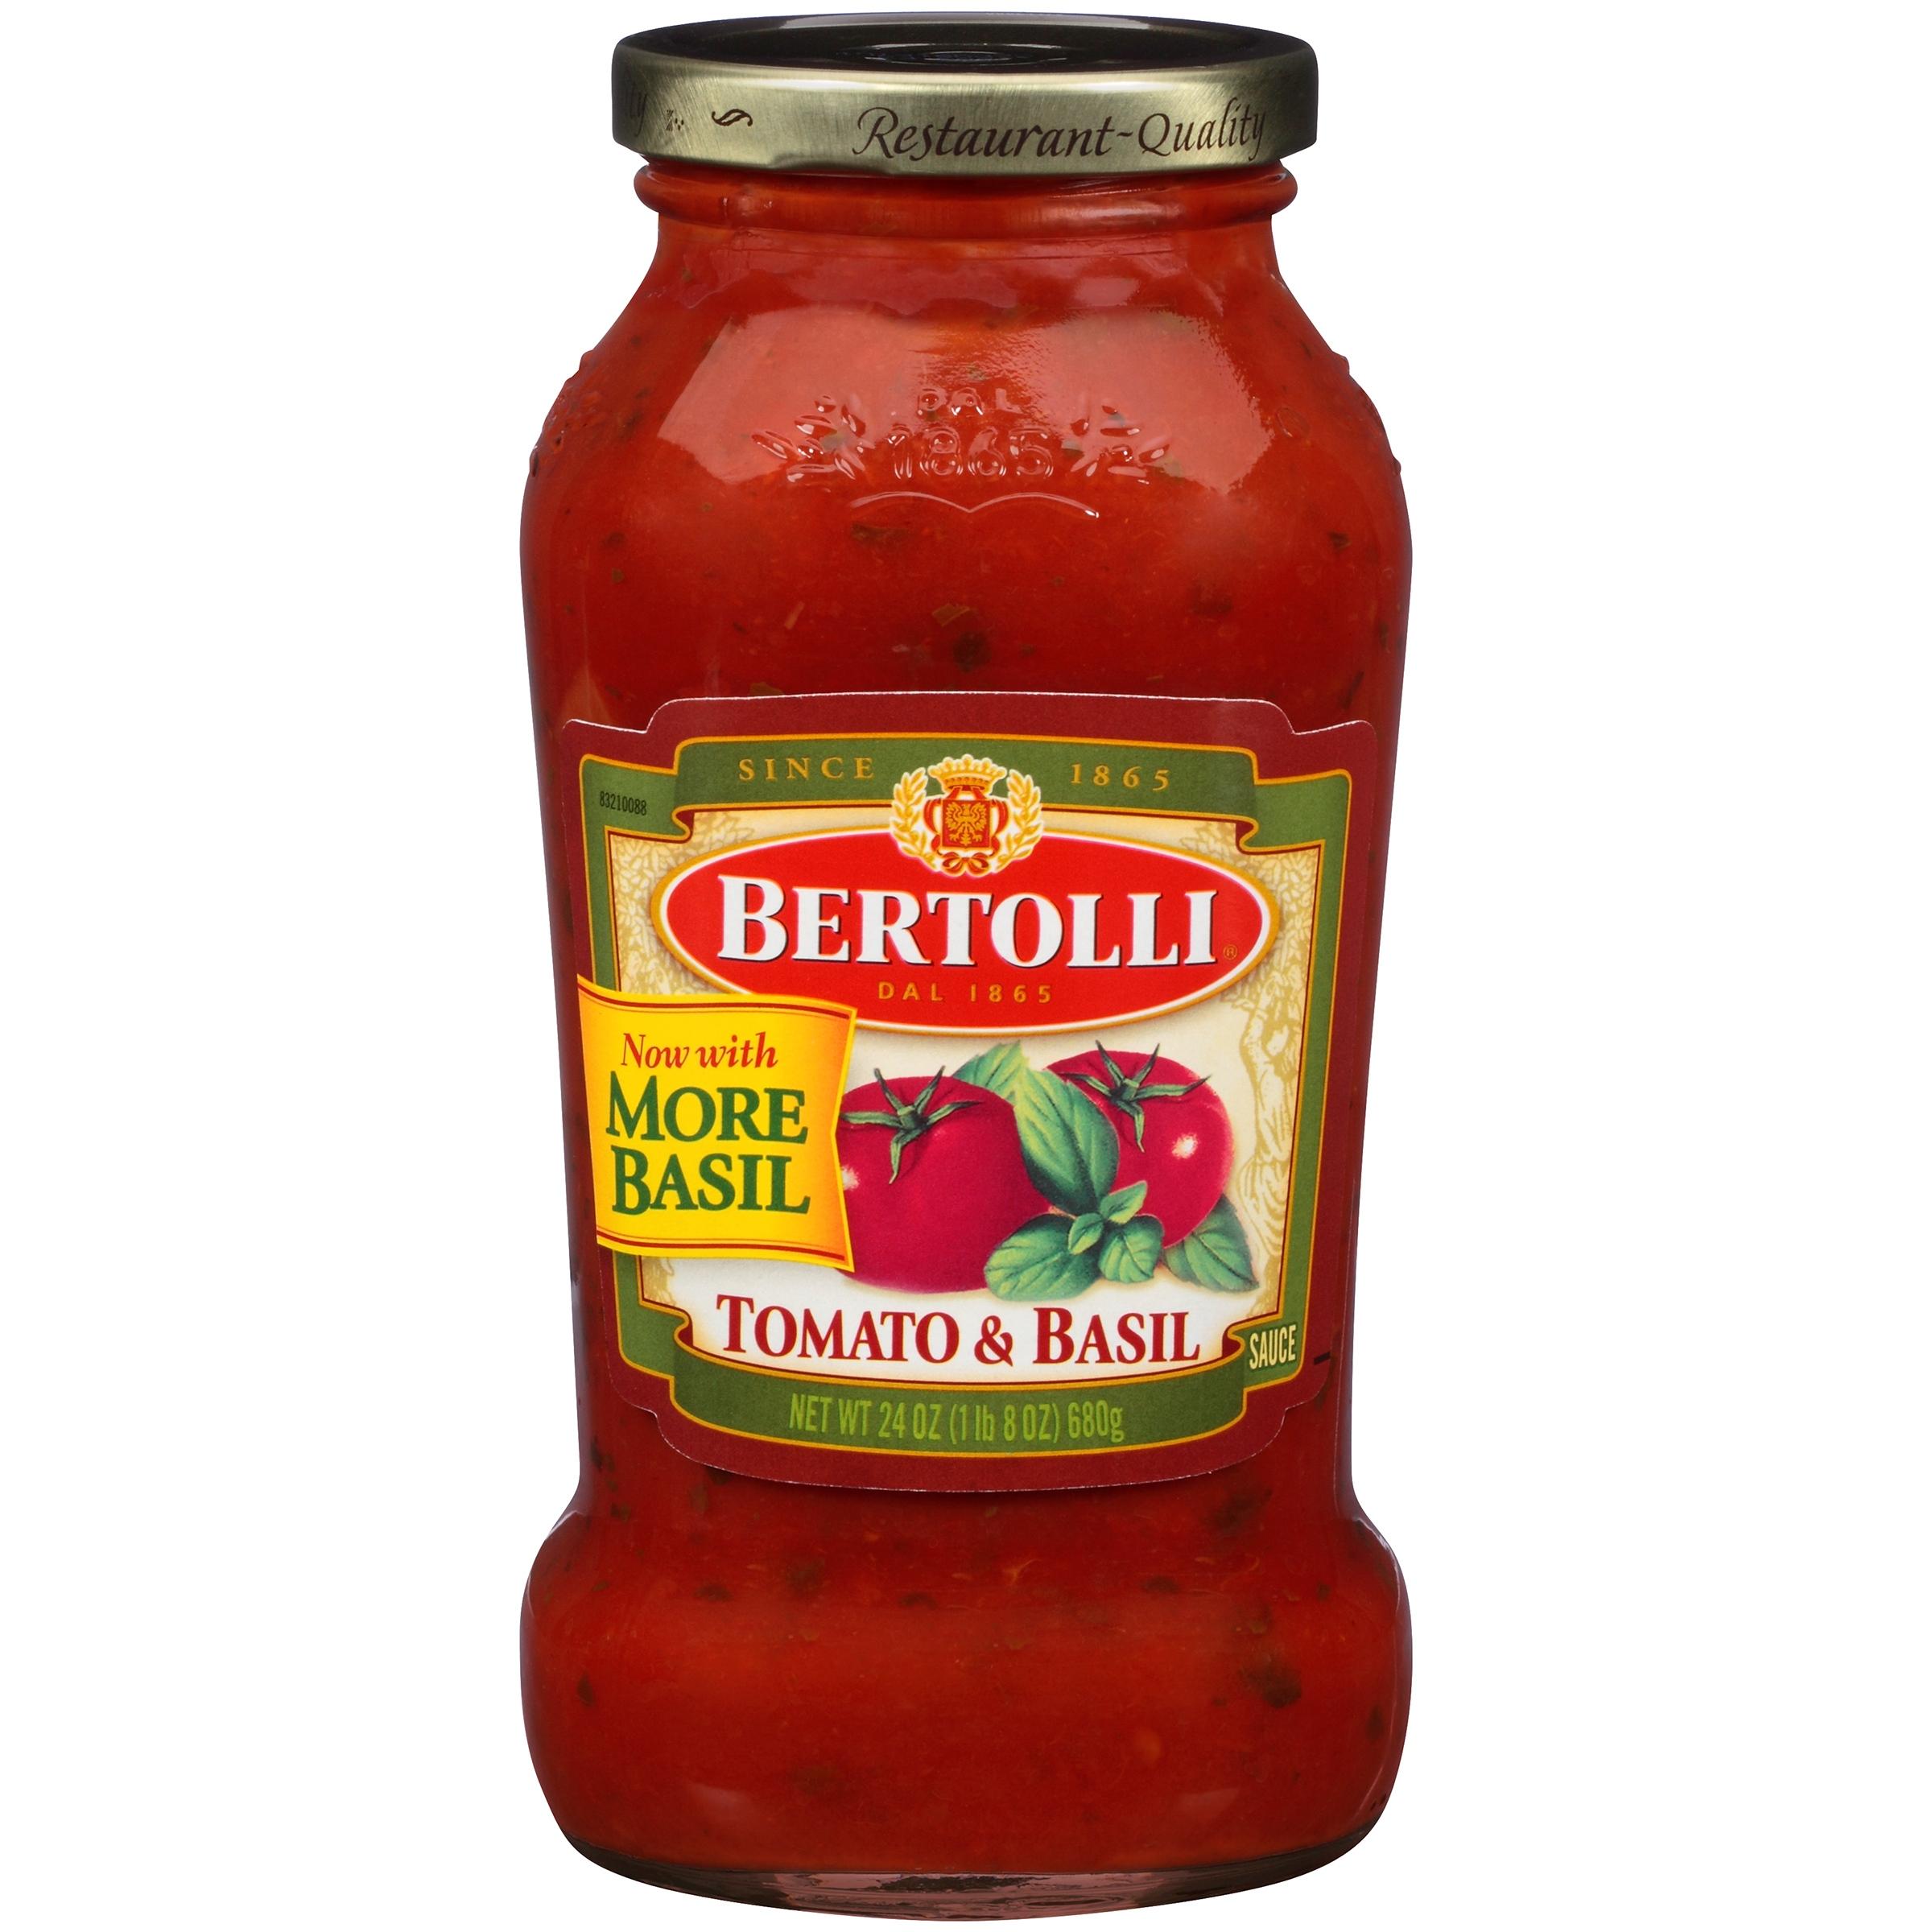 Bertolli Tomato & Basil Pasta Sauce 24 oz.